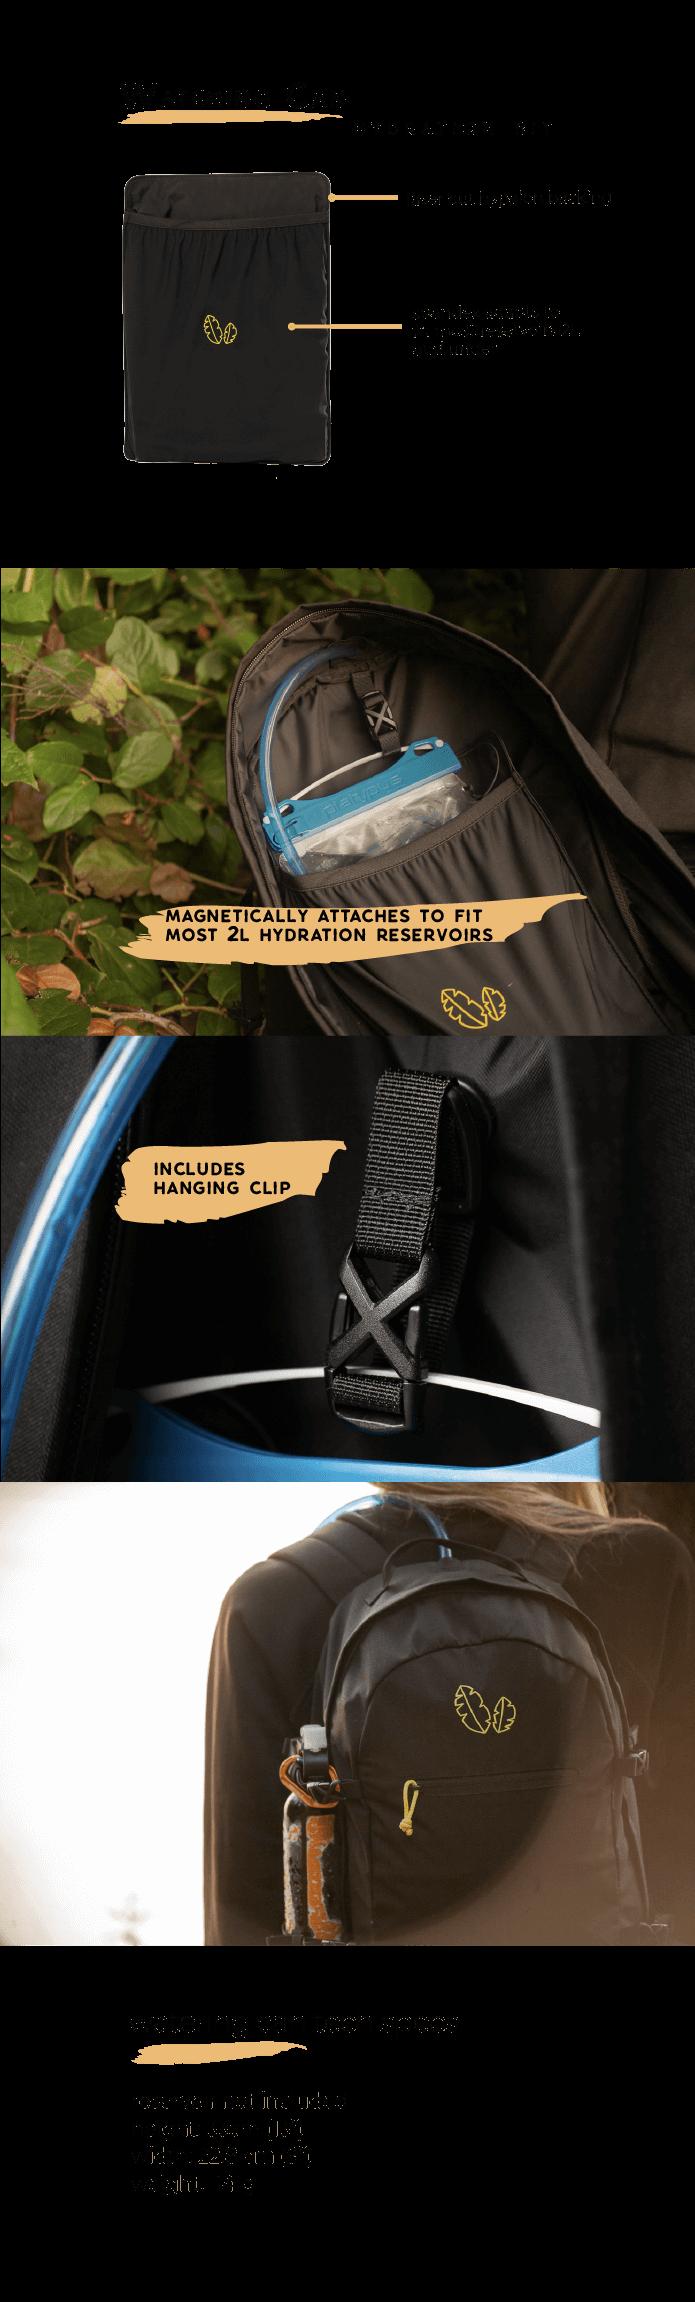 "Silverline 237618 Euro Bayonet Coupler ¼"" BSP Male Thread 2pk 1//4/"" BSP"